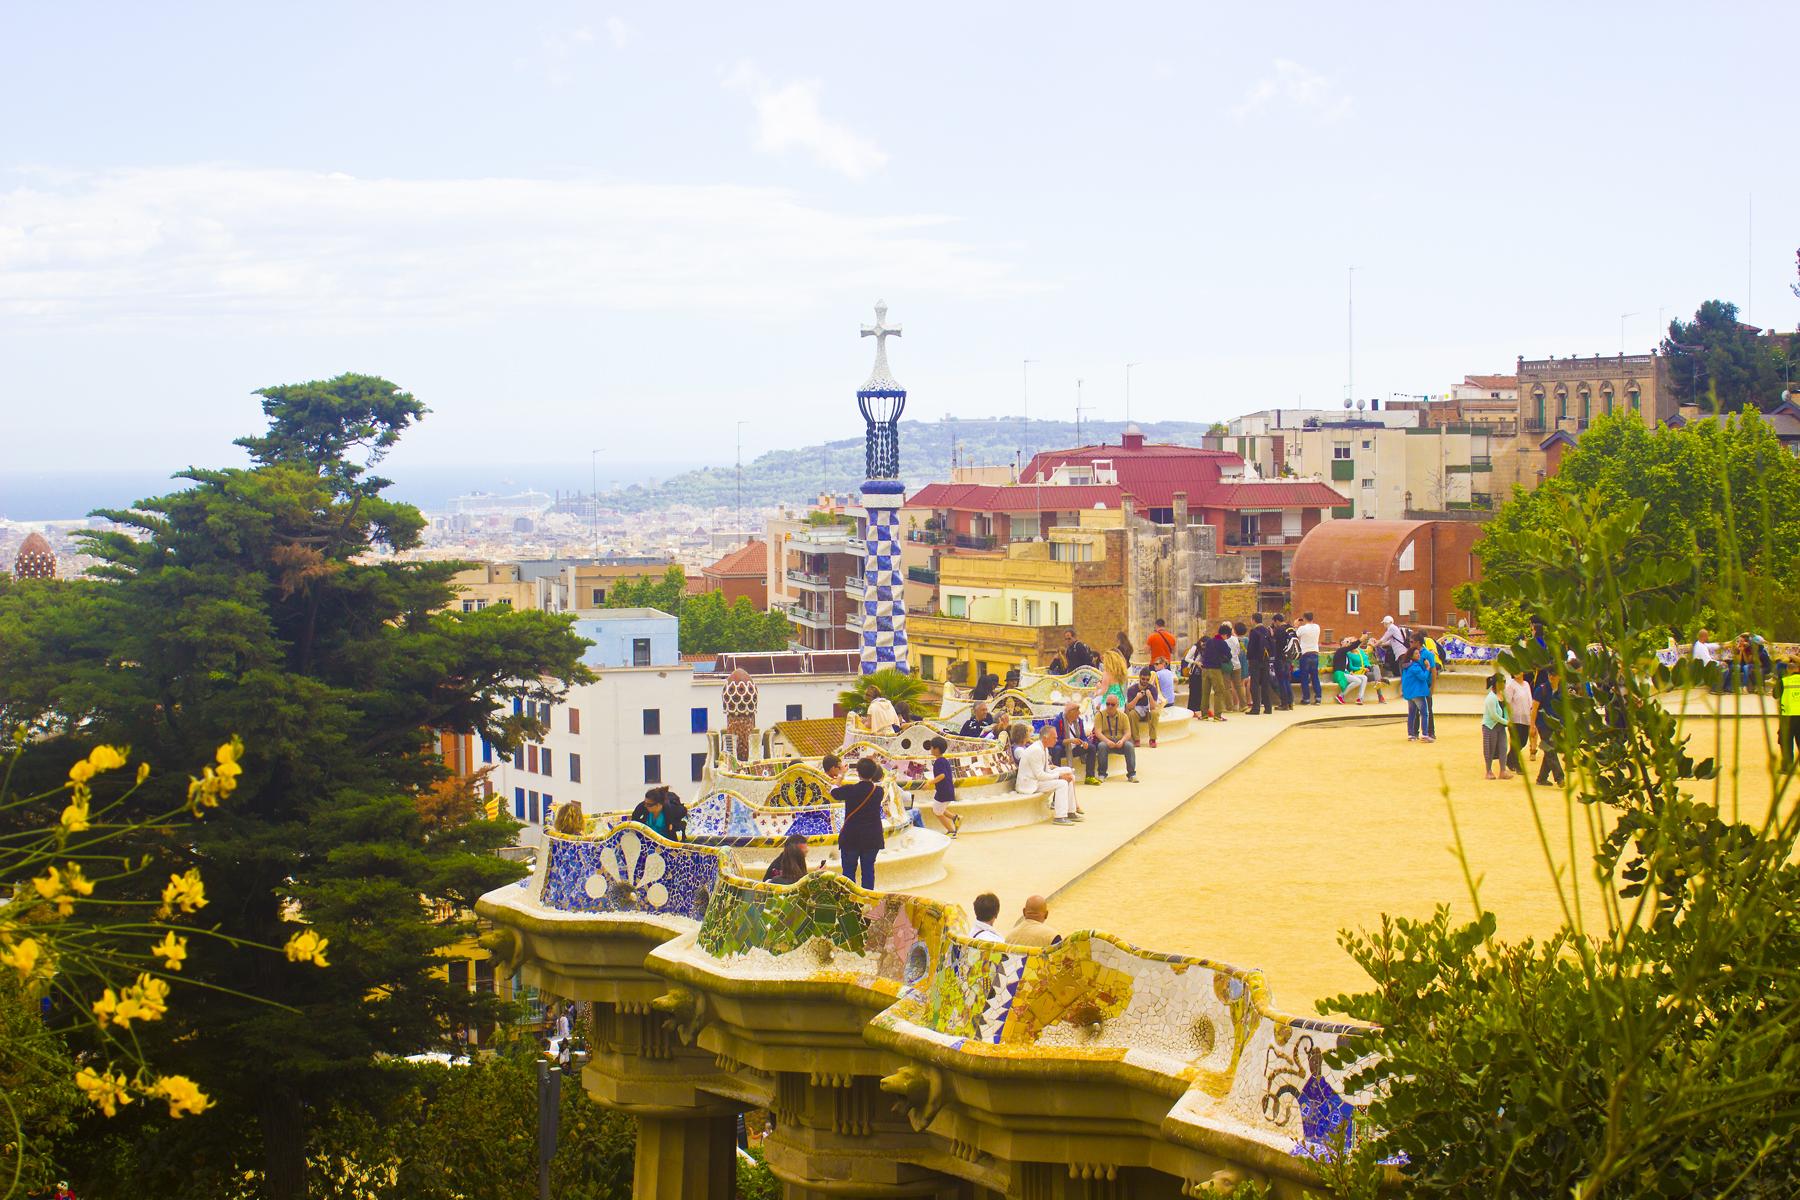 Parc Guell Gaudi Barcelona Spain Tapeparade blog tape parade